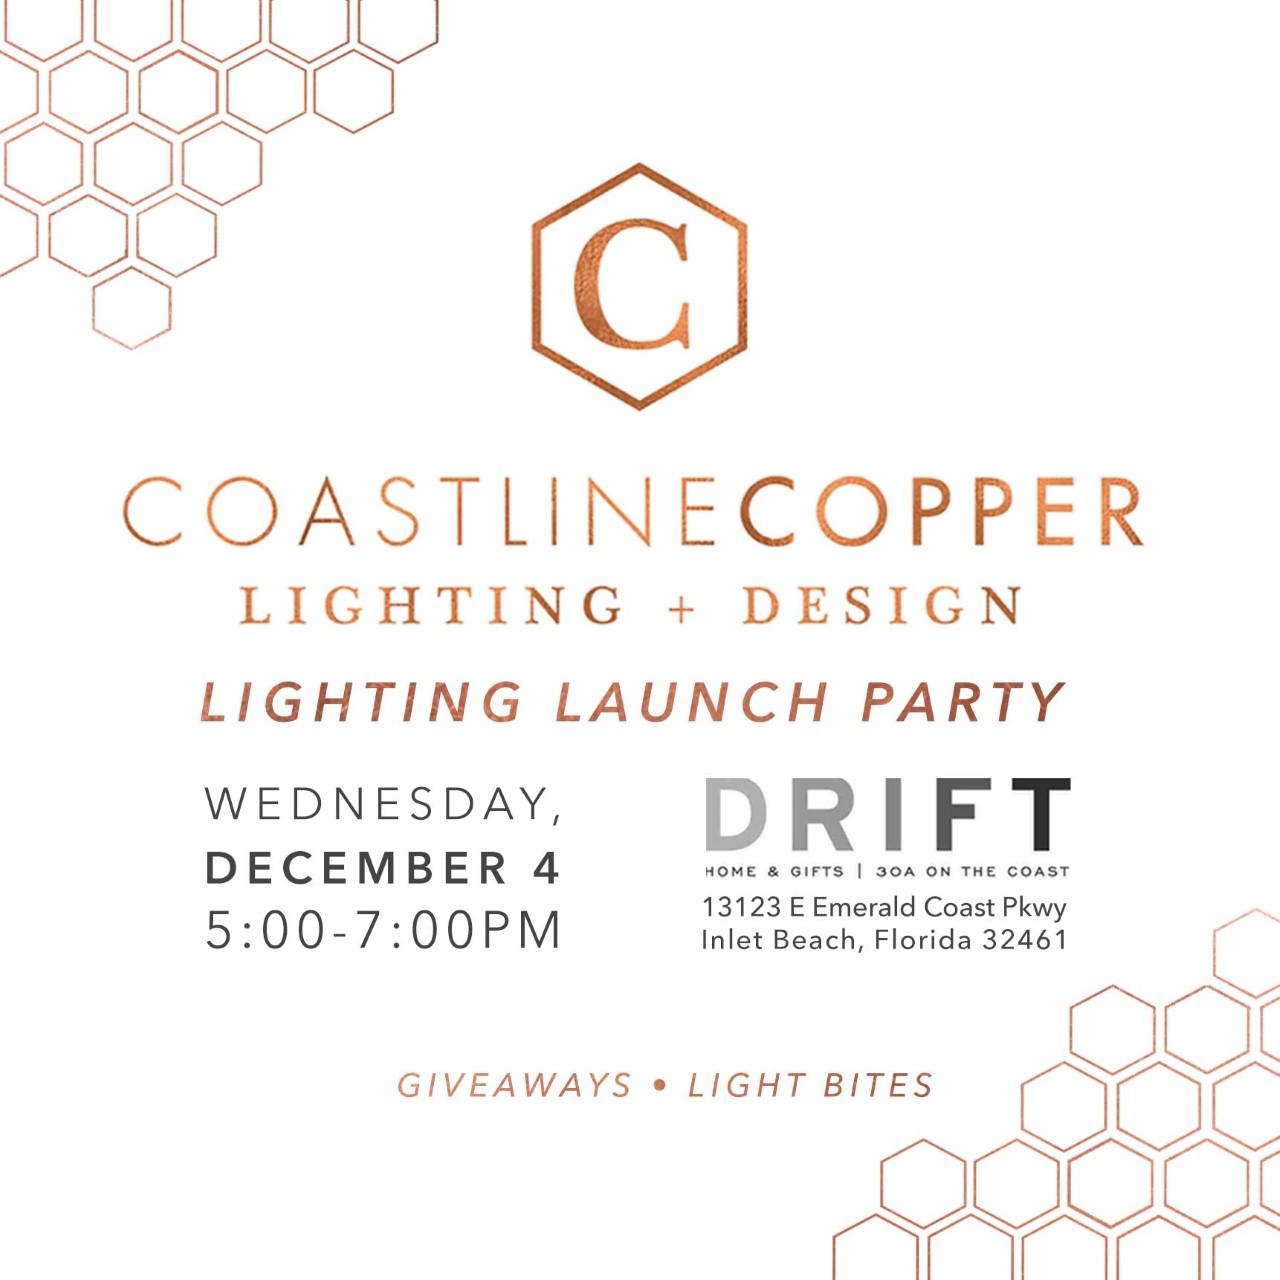 Coastline Copper Lighting & Design Launch Party